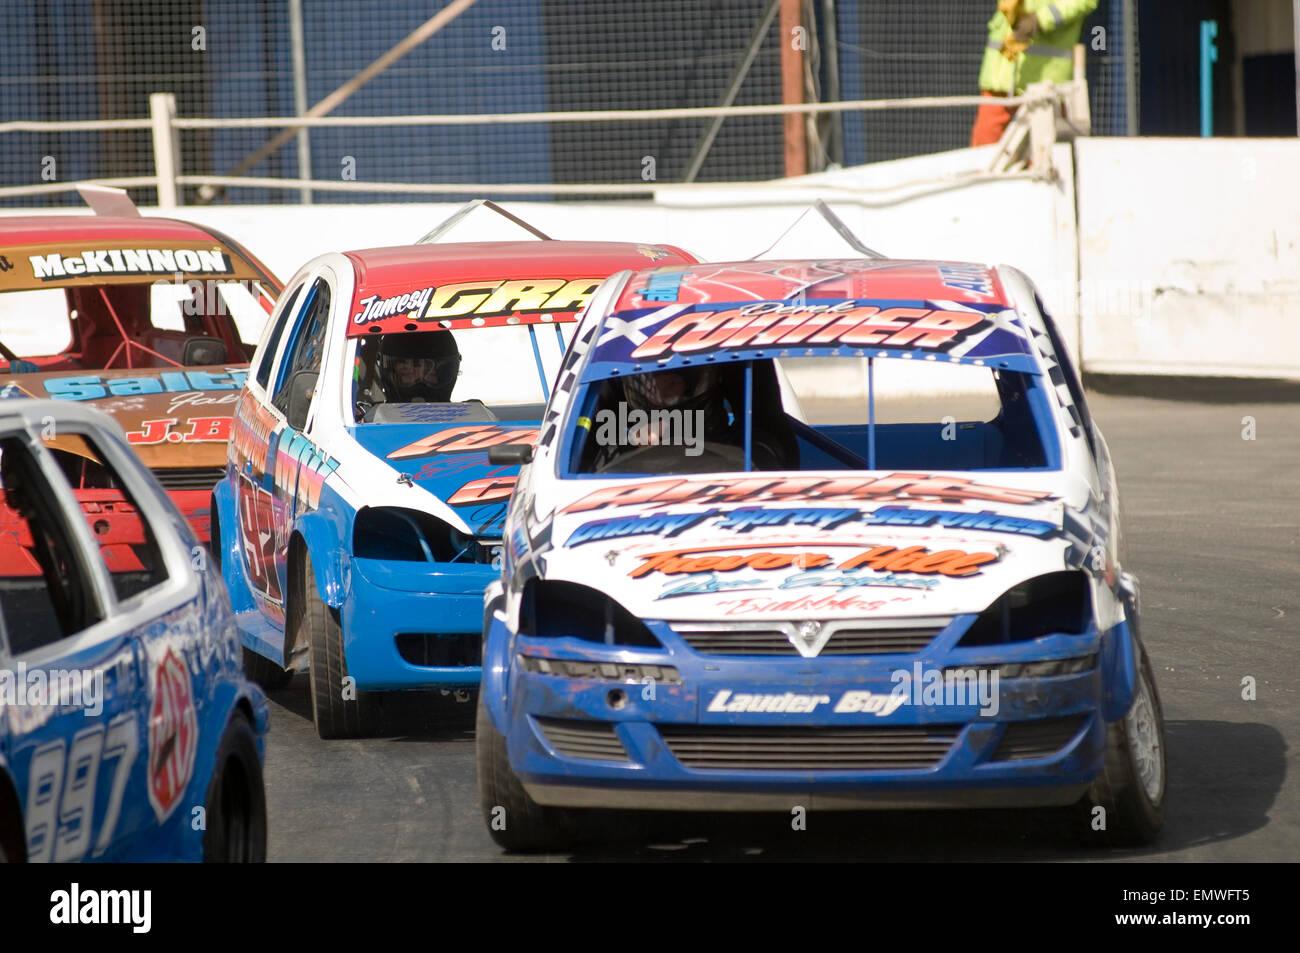 Vauxhall Corsa's hot rod compitiendo en una carrera de autos Imagen De Stock